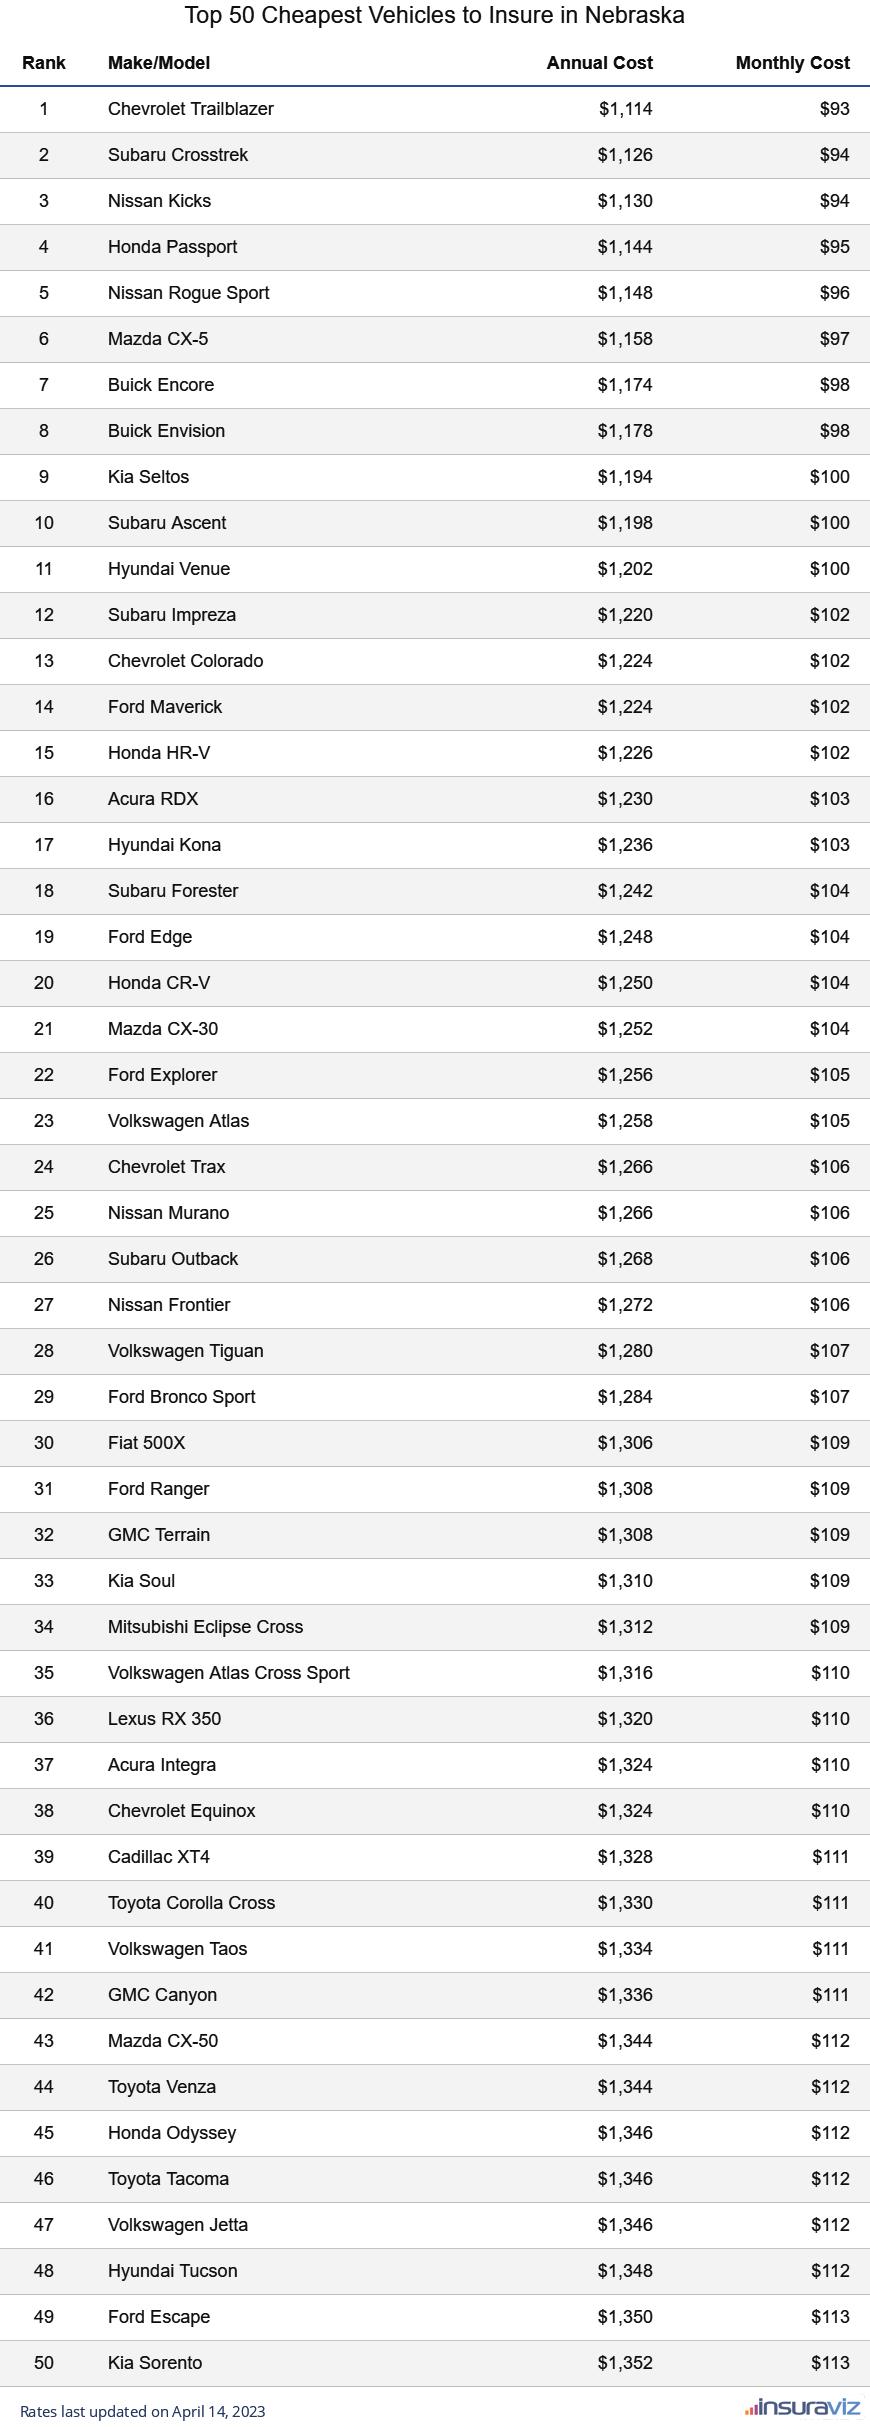 Top 50 Cheapest Vehicles to Insure in Nebraska